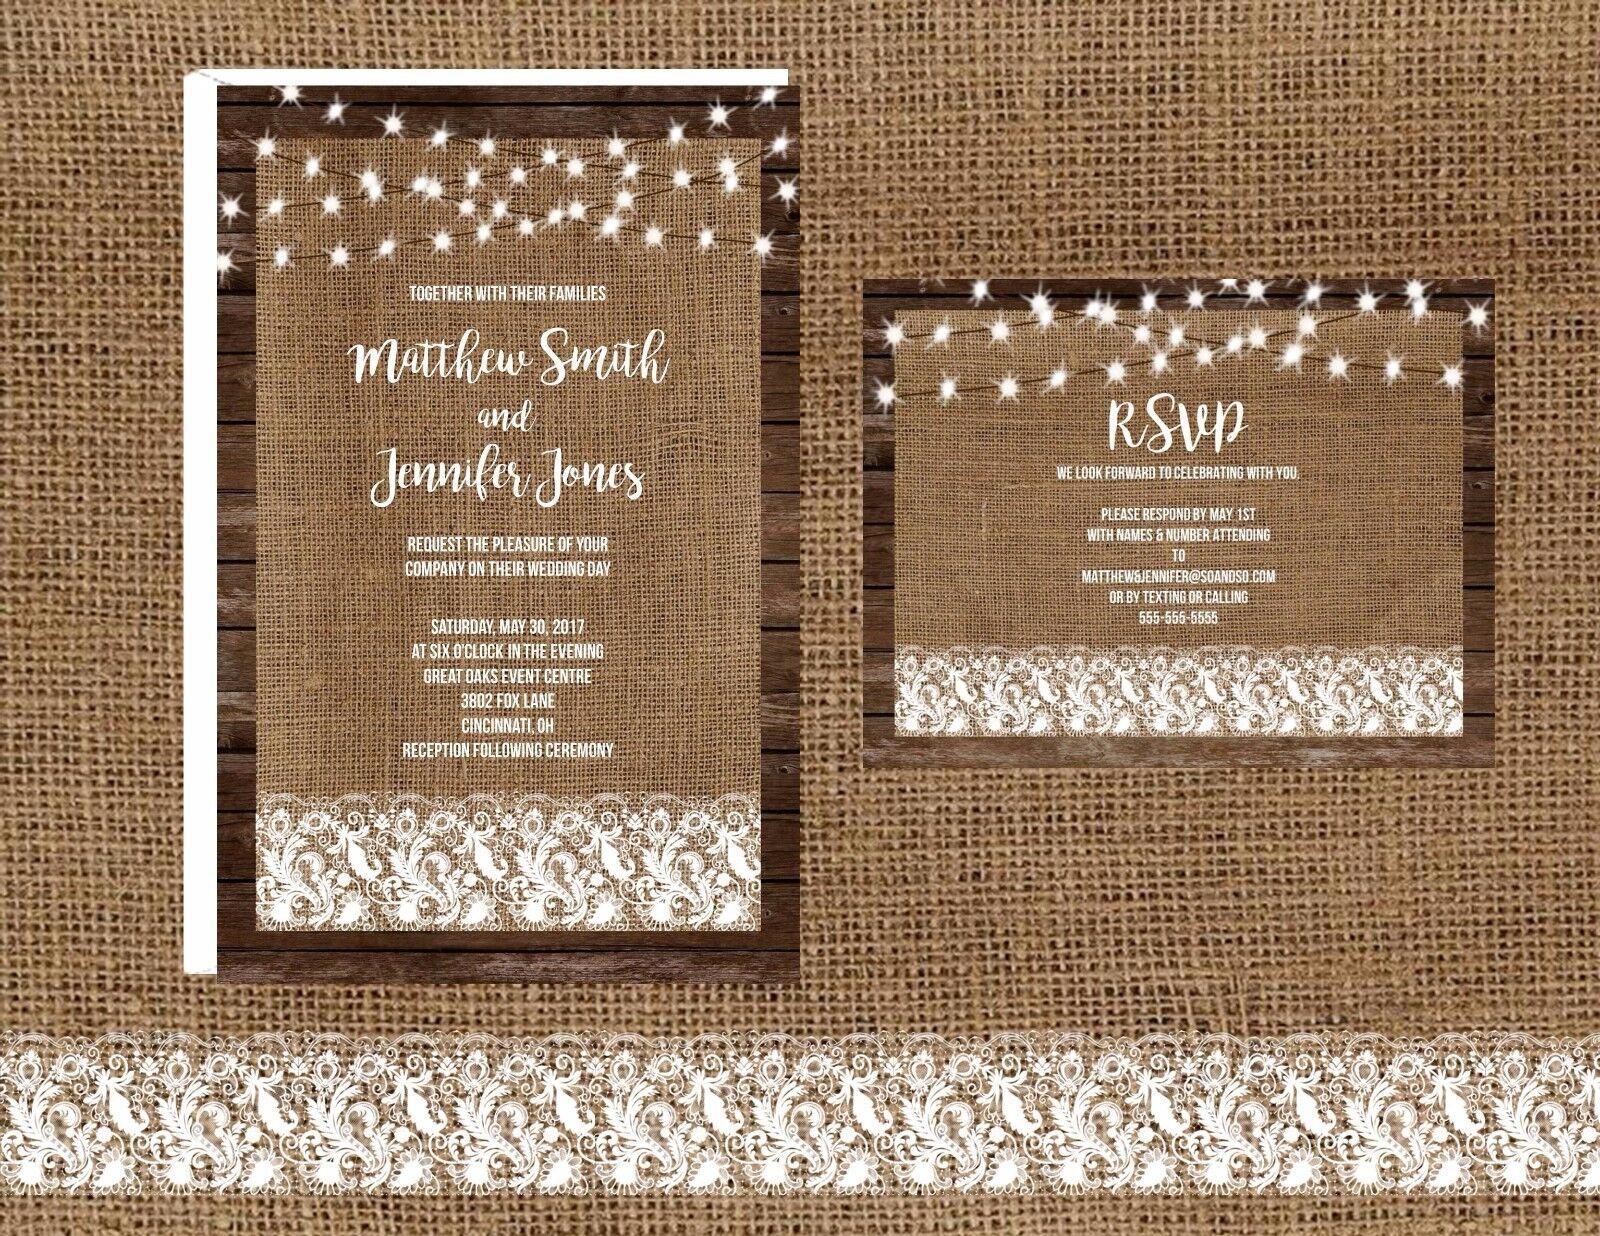 Wedding Invitations Rustic Wood Burlap Lights & Lace 50 Invitations & RSVP Cards